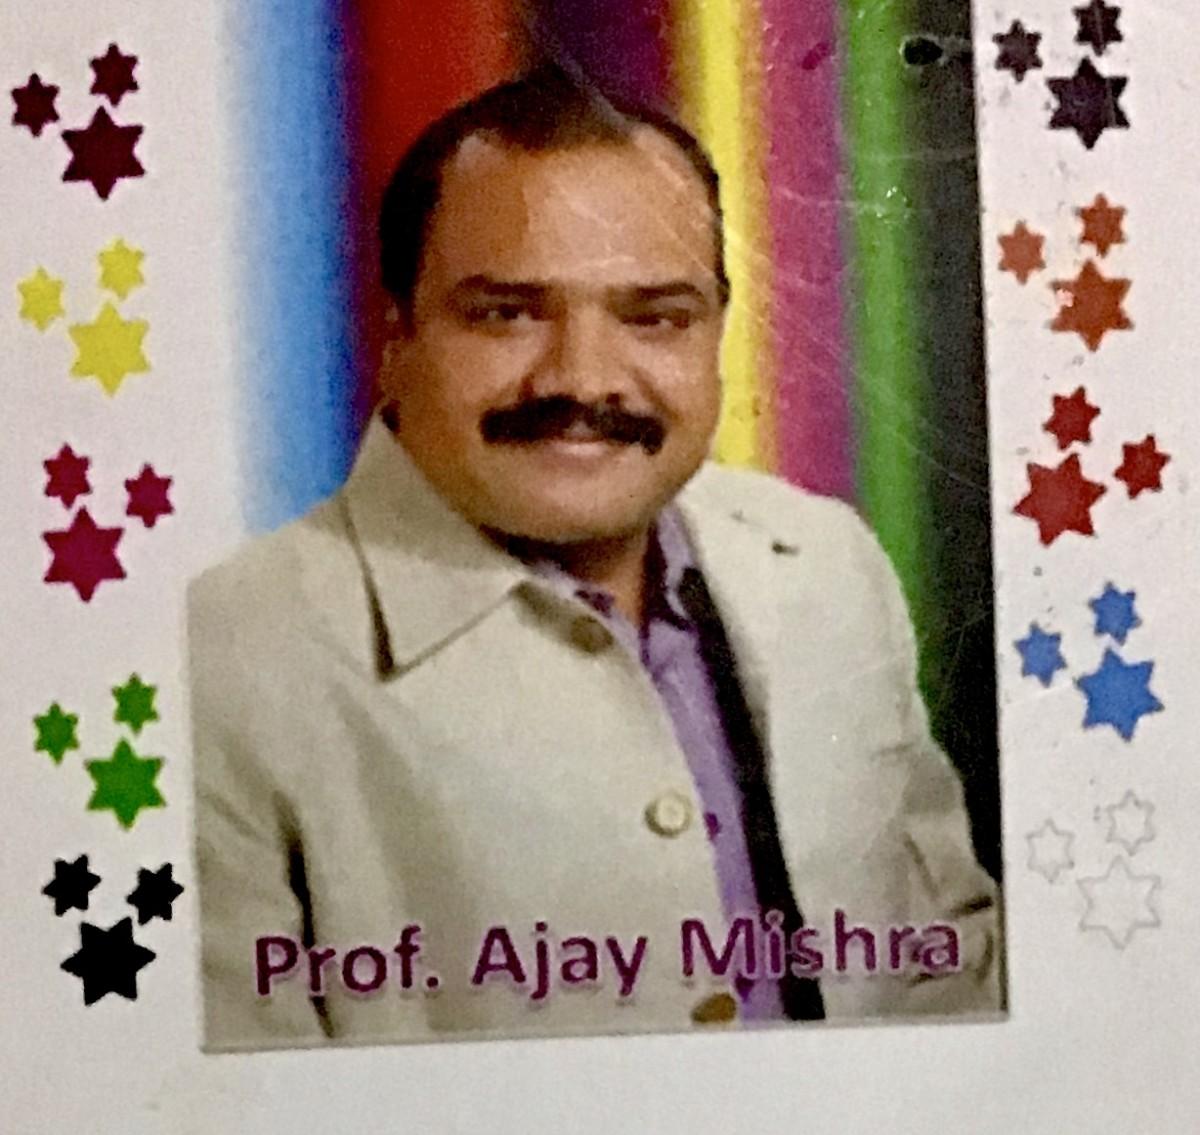 Professor Ajay Mishra